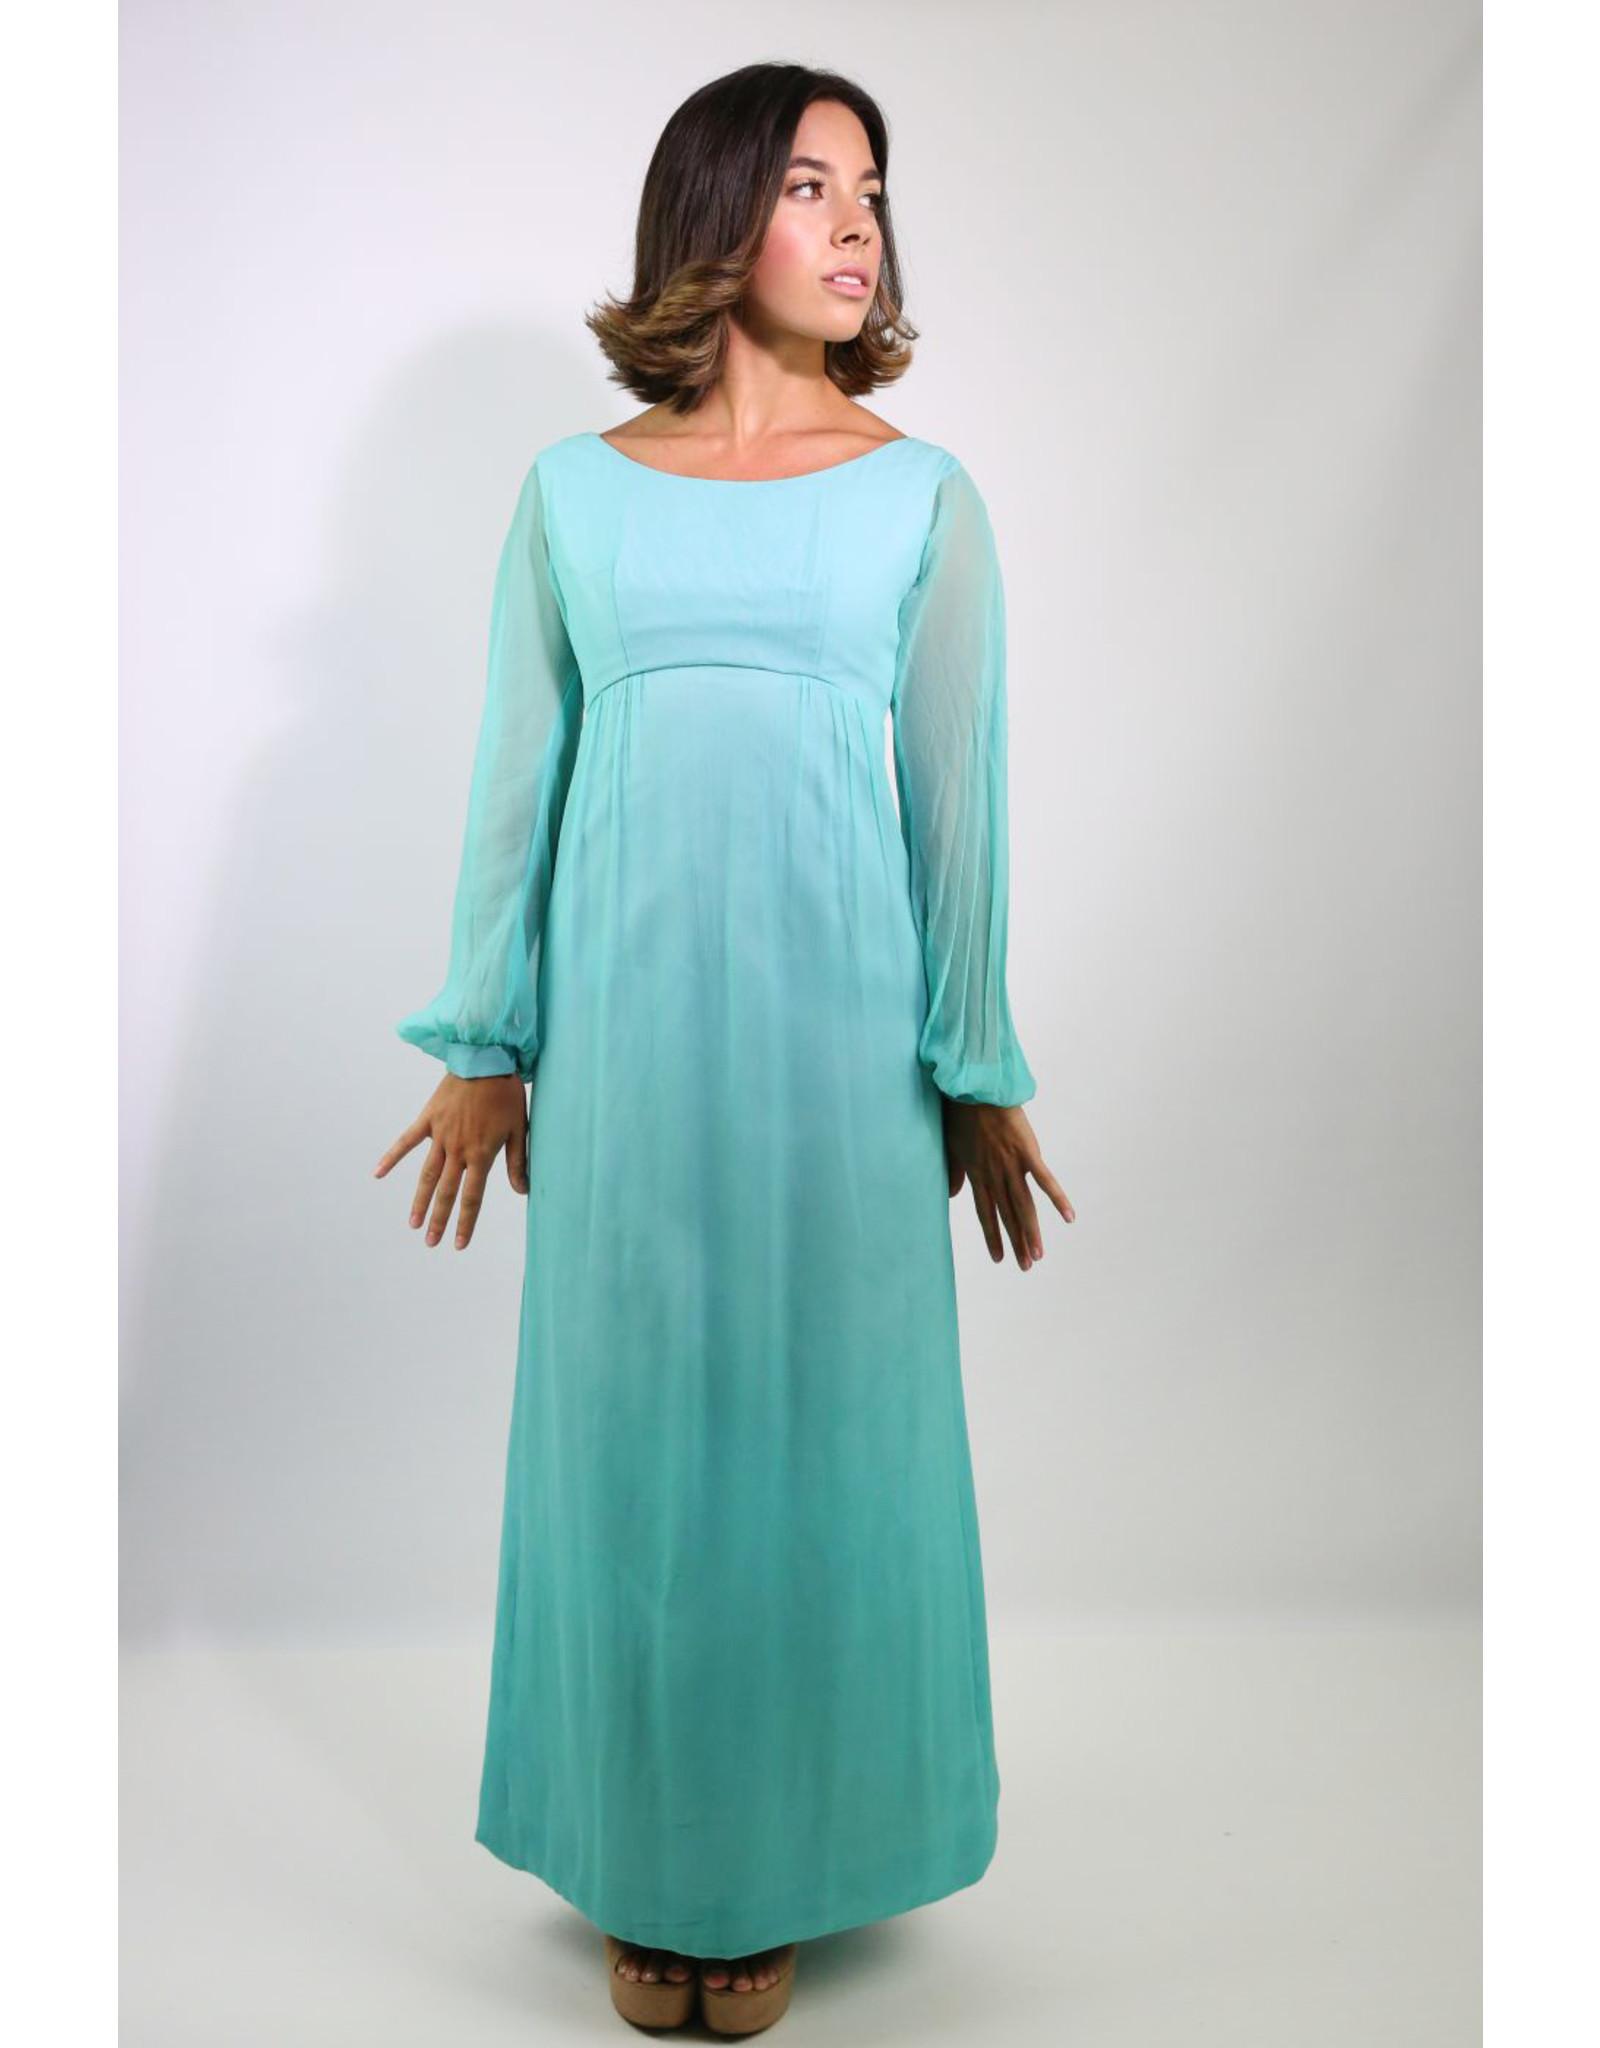 1960's Blue Convertible Bridesmaid Dress